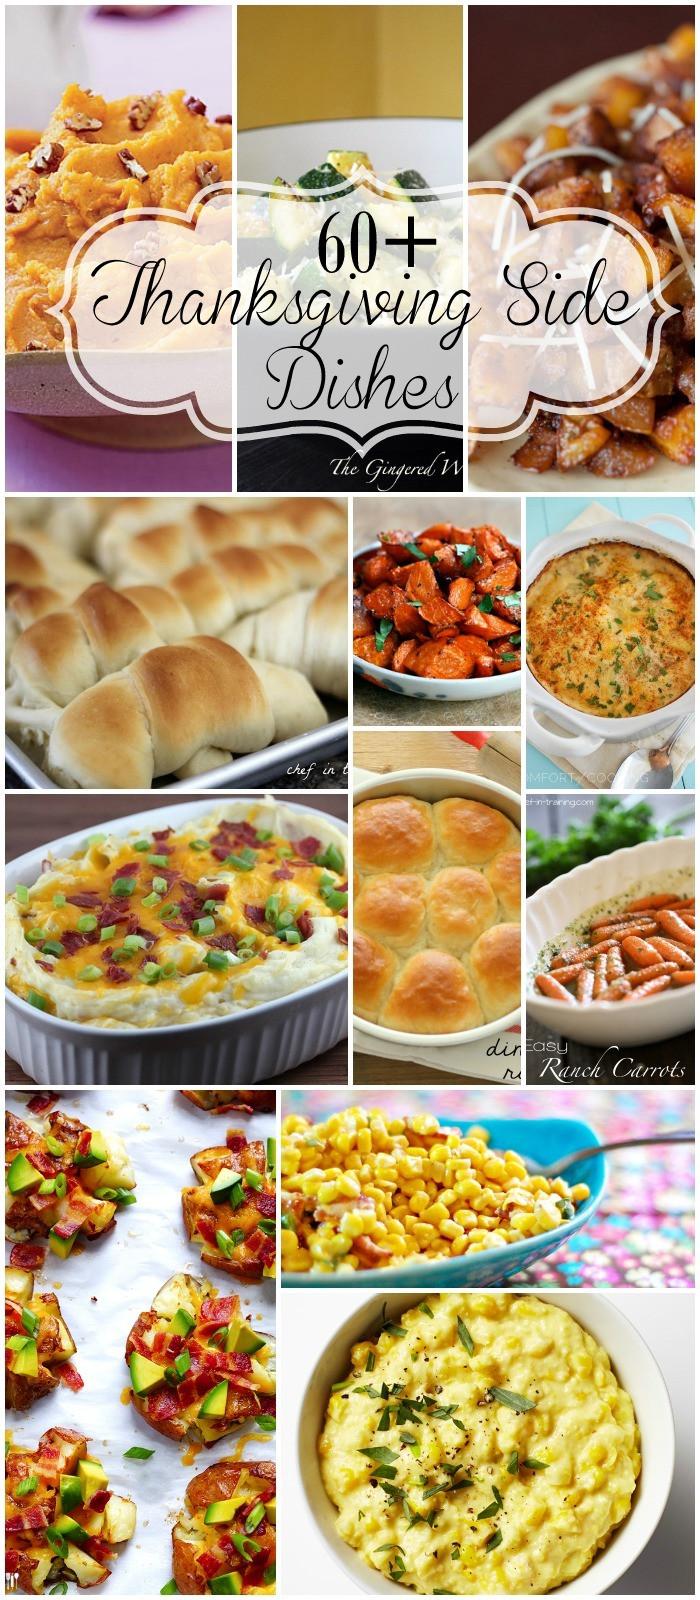 Thanksgiving Dinner Sides  60 Thanksgiving Sides Recipes